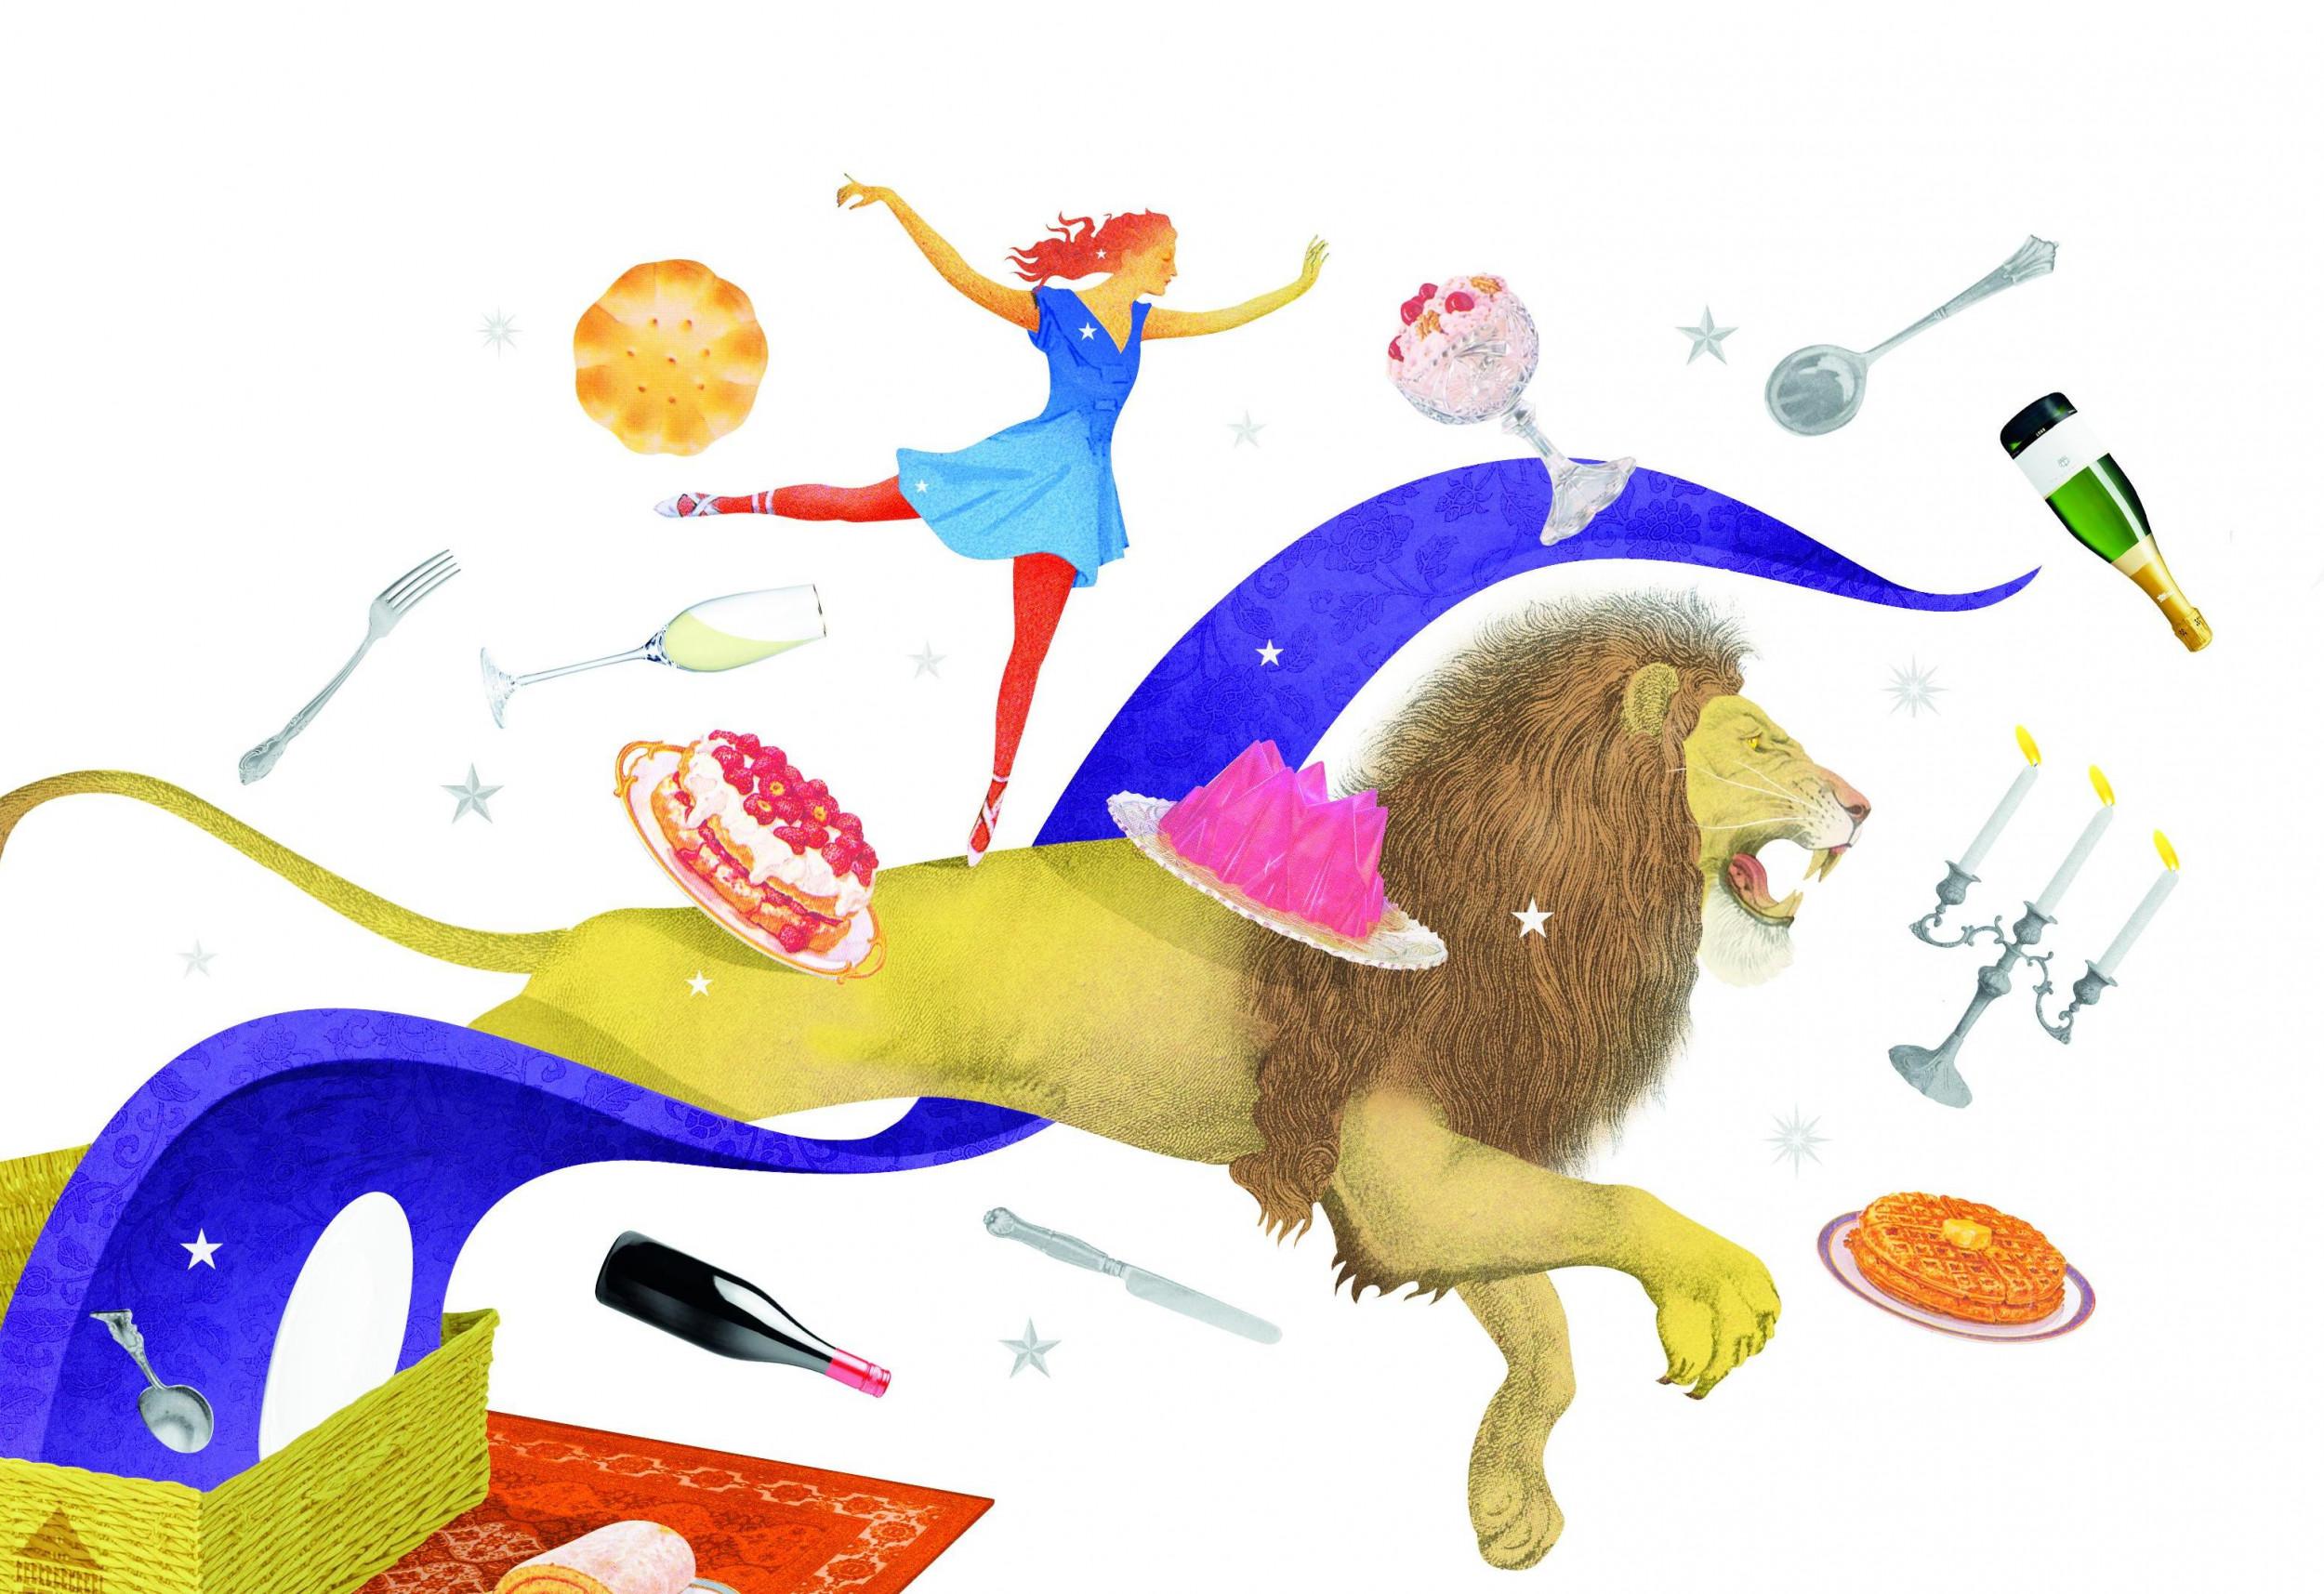 Illustration party